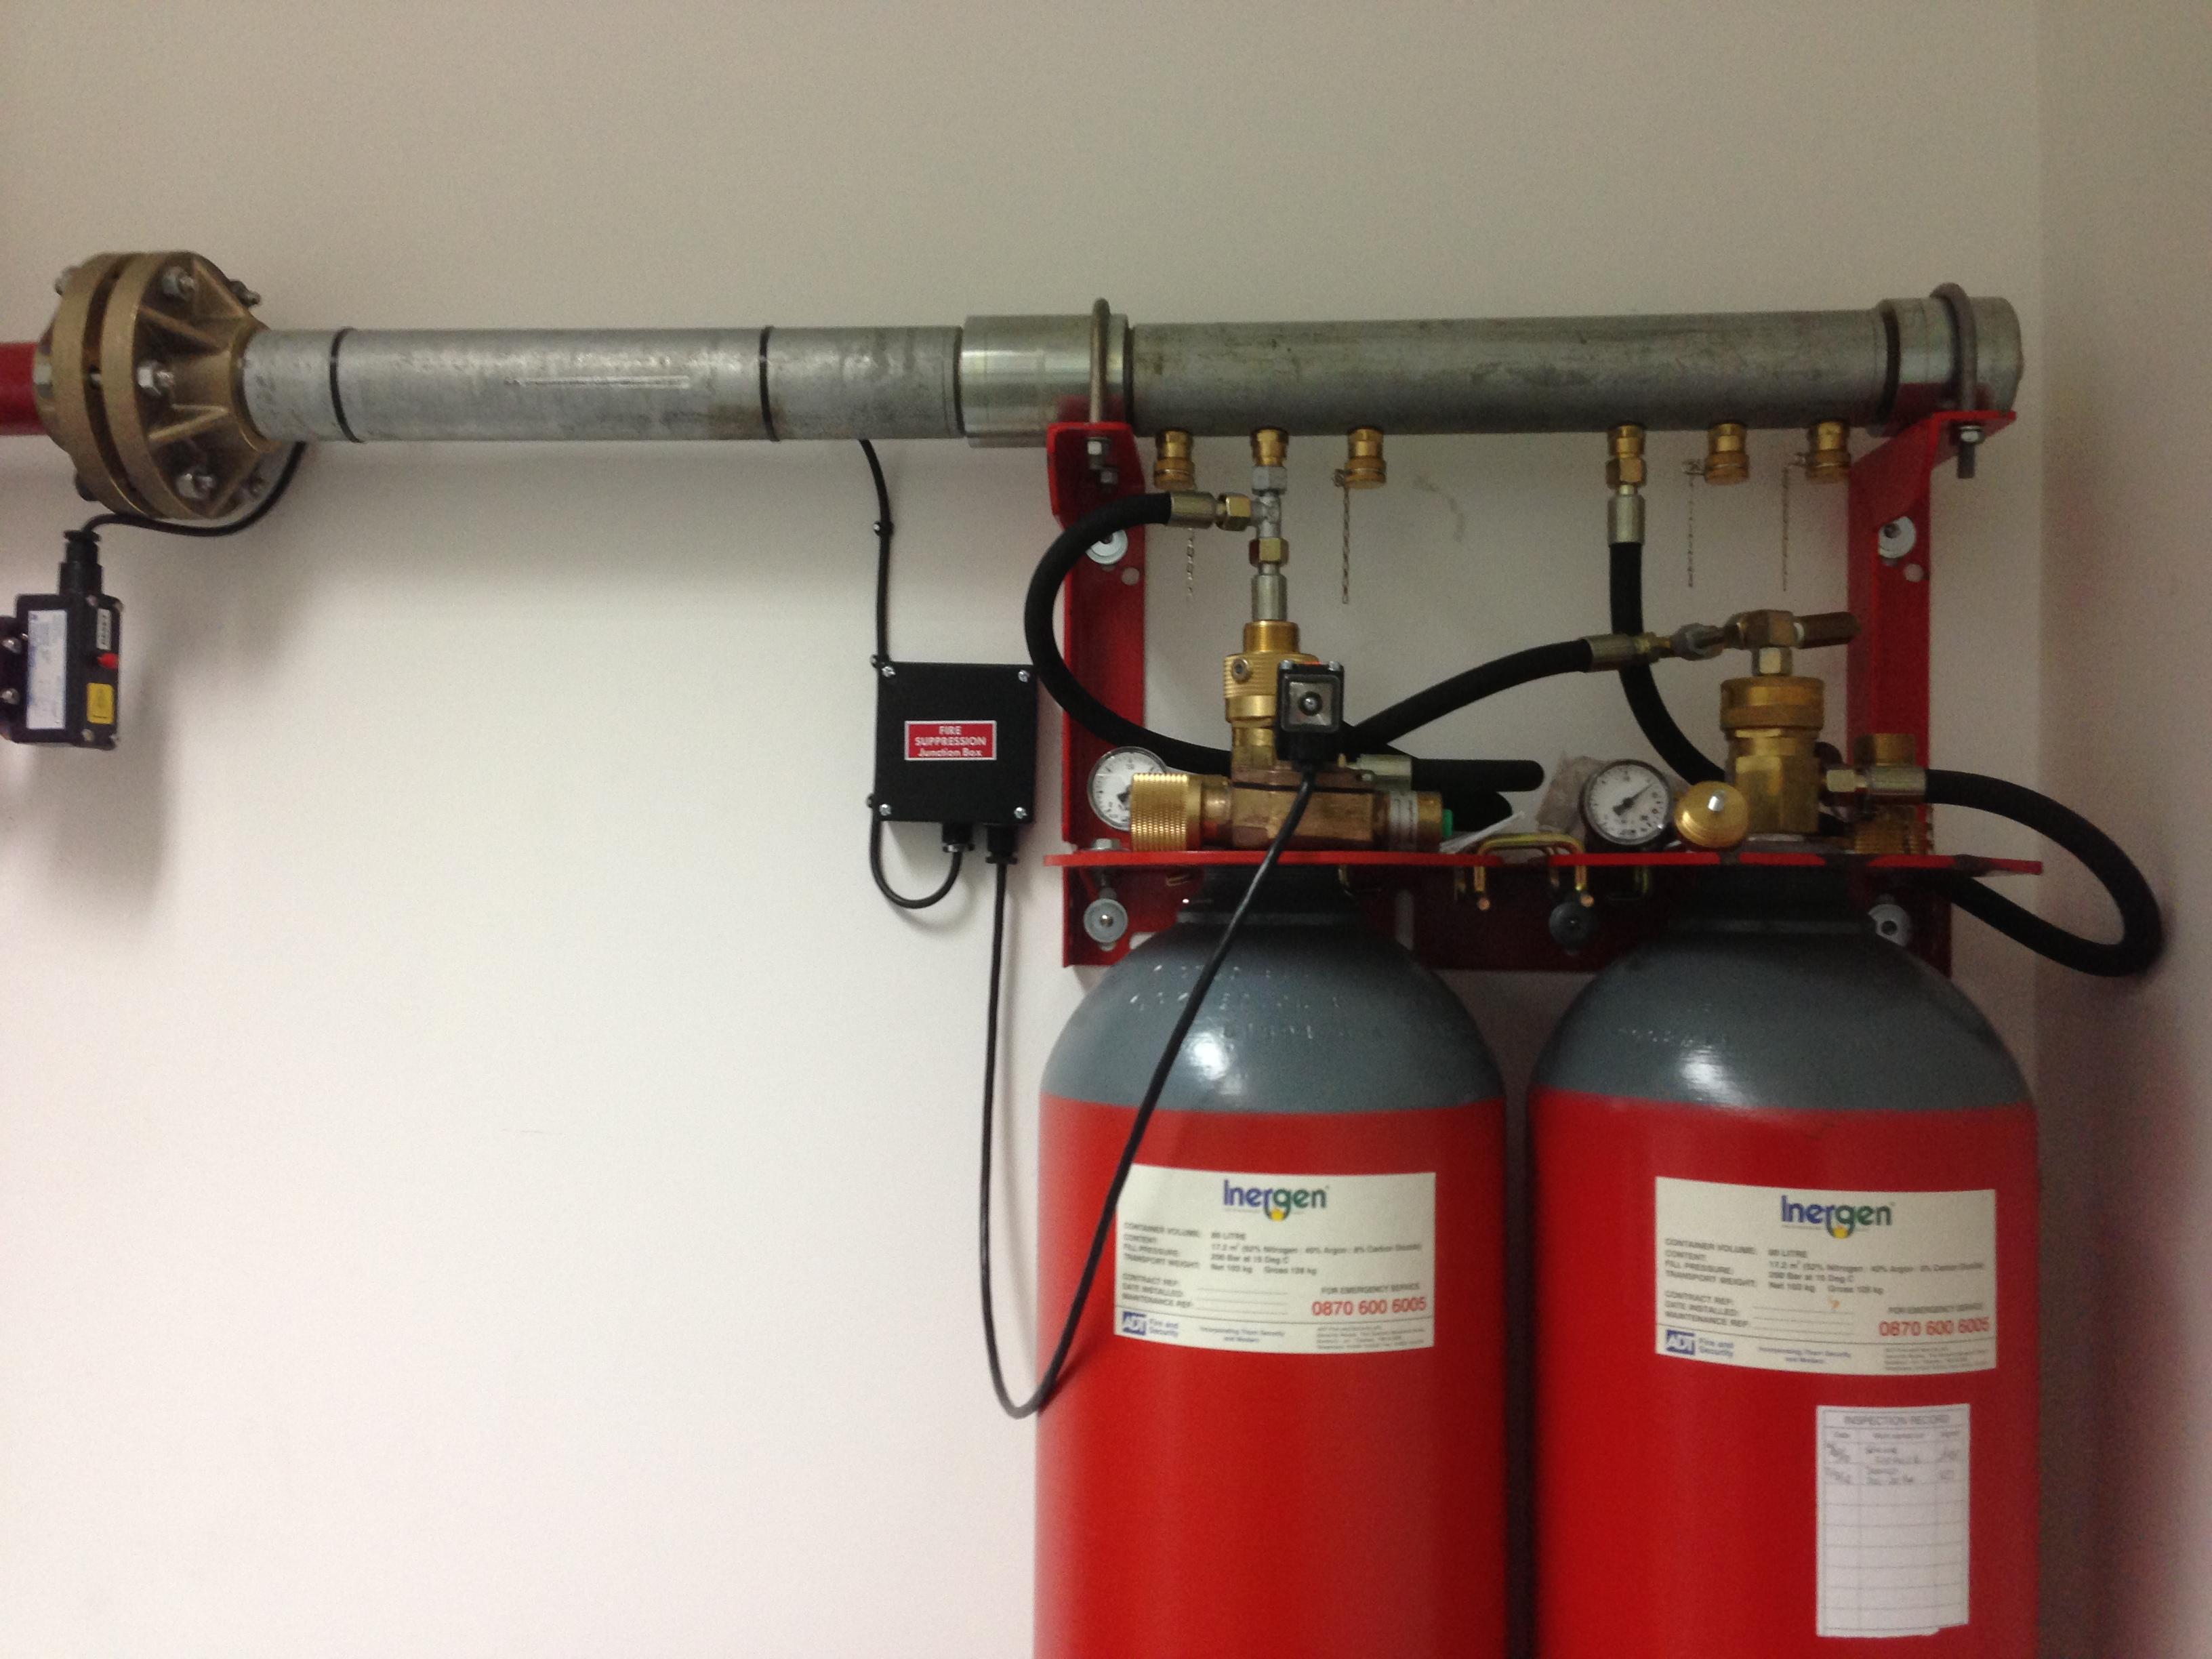 Inergen 200 bar 2 Cylinder Manifolded System